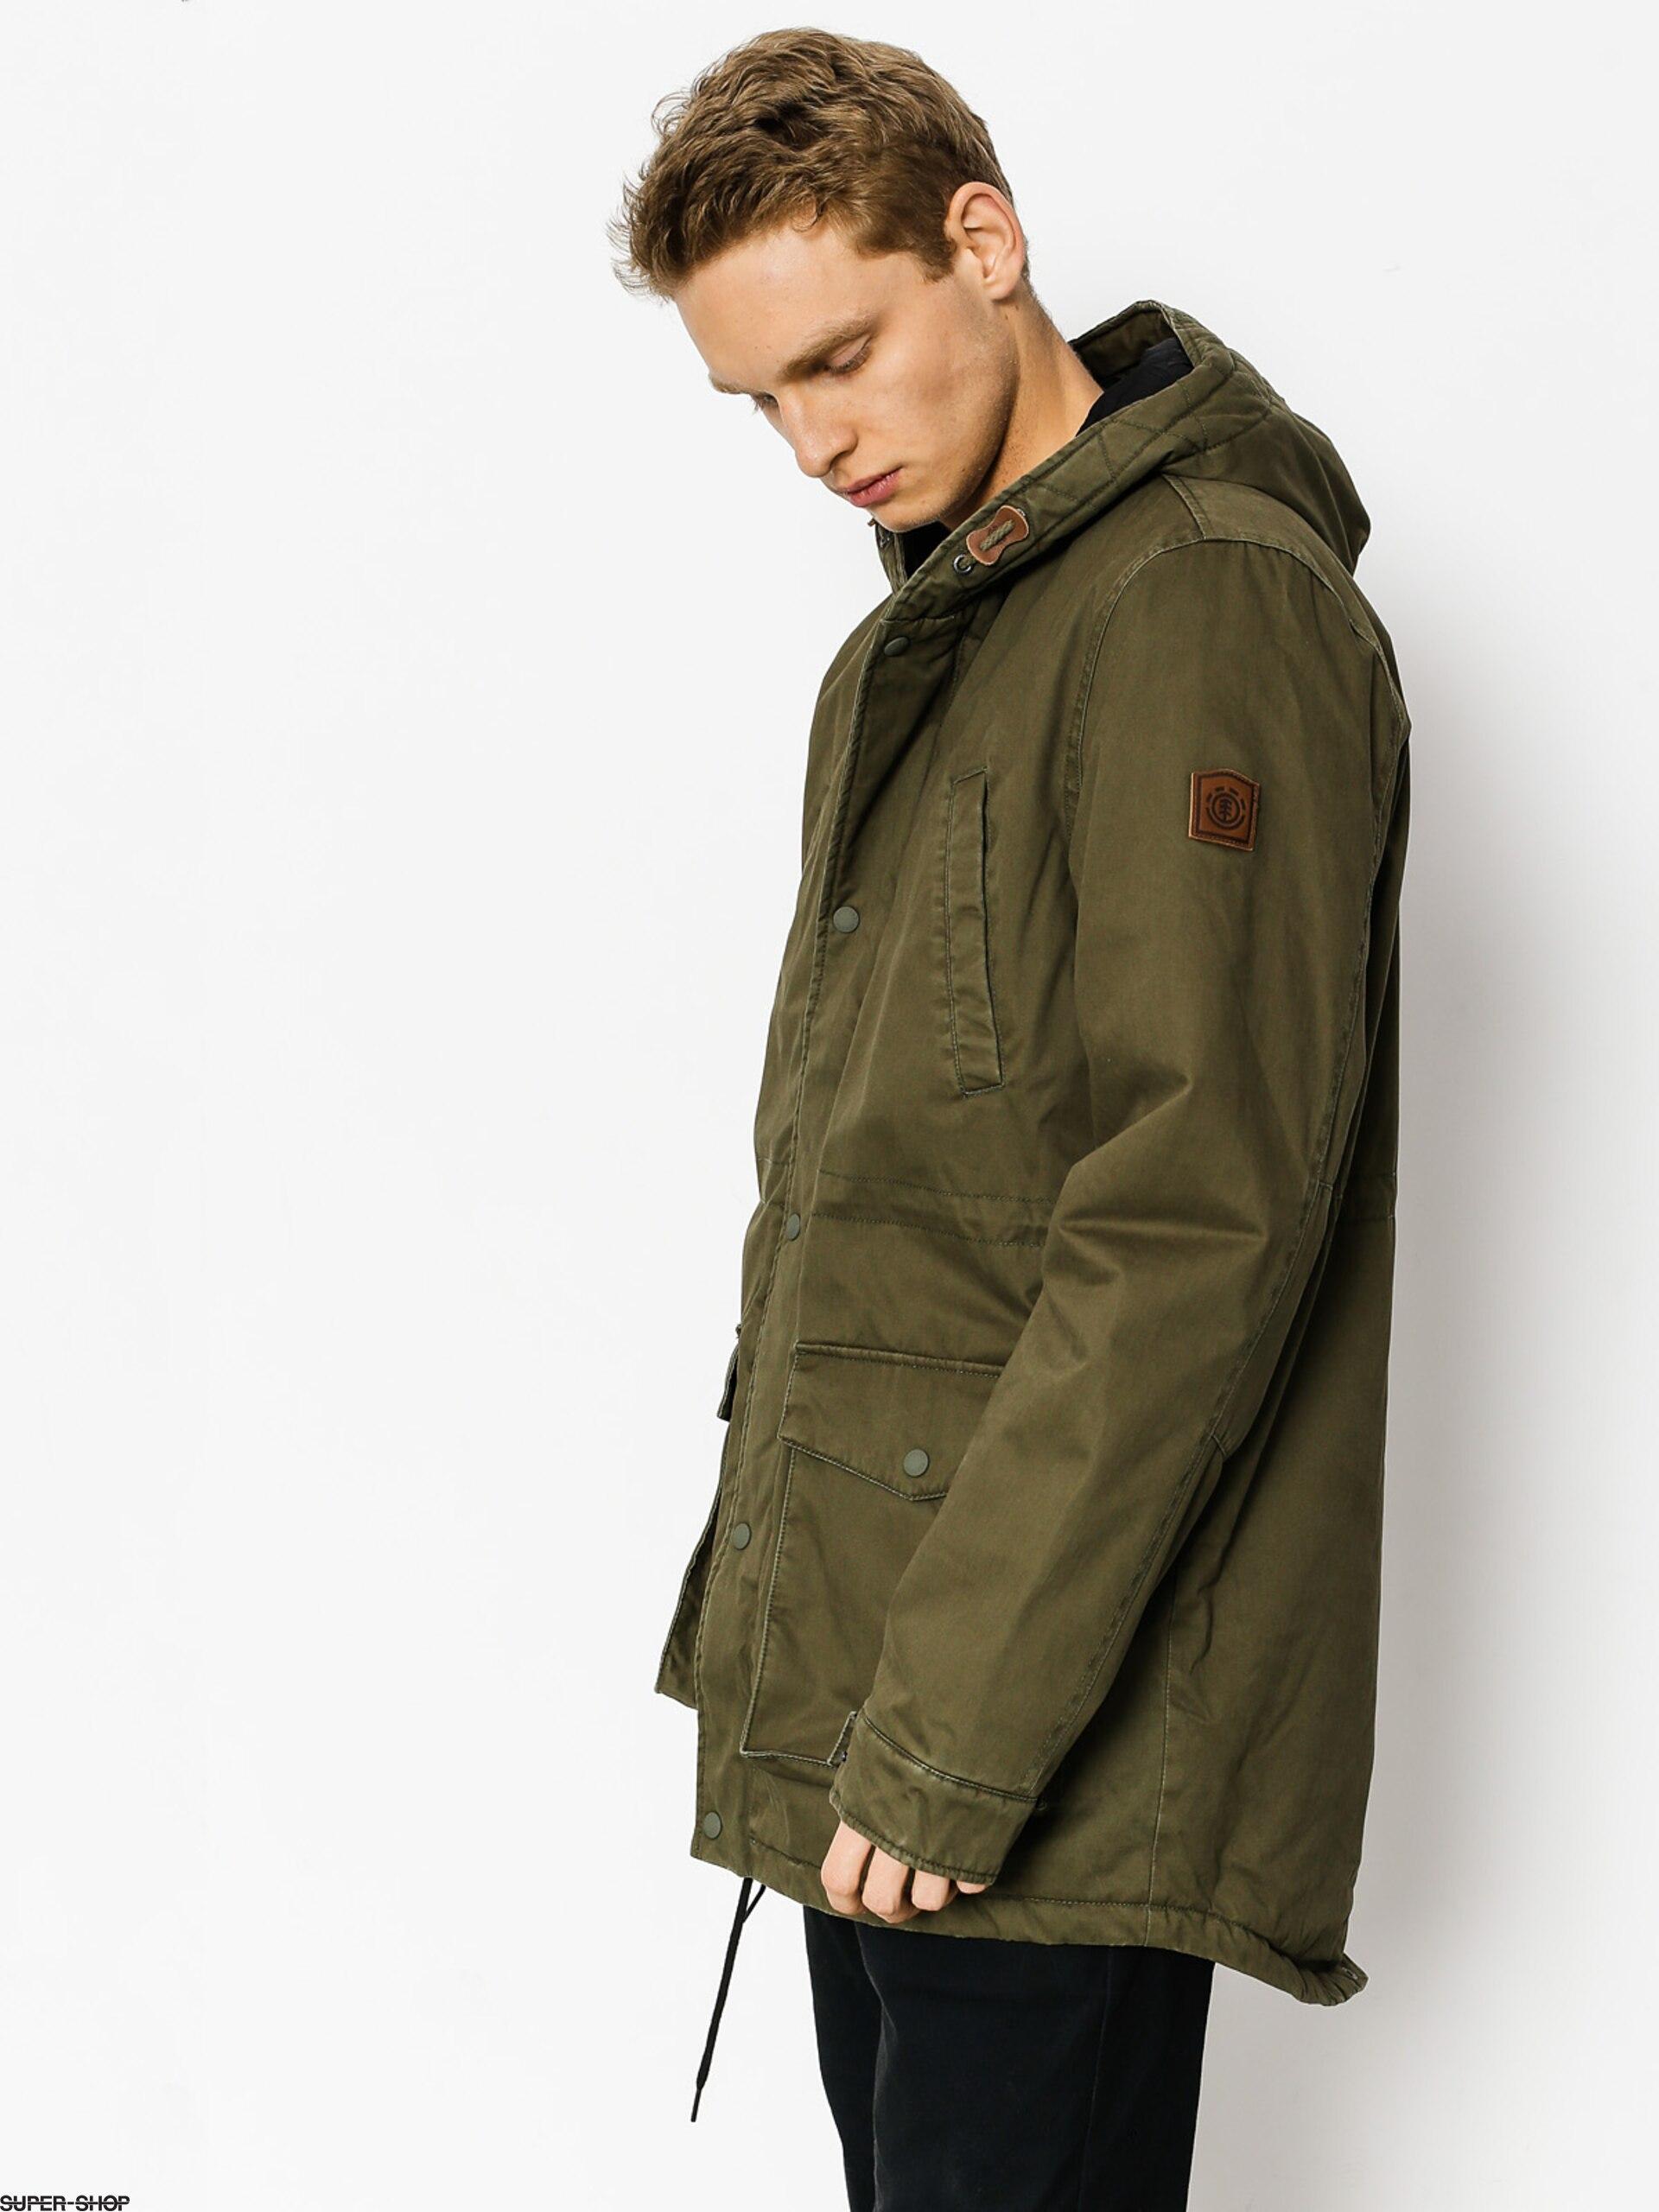 The CS Moss Jacket